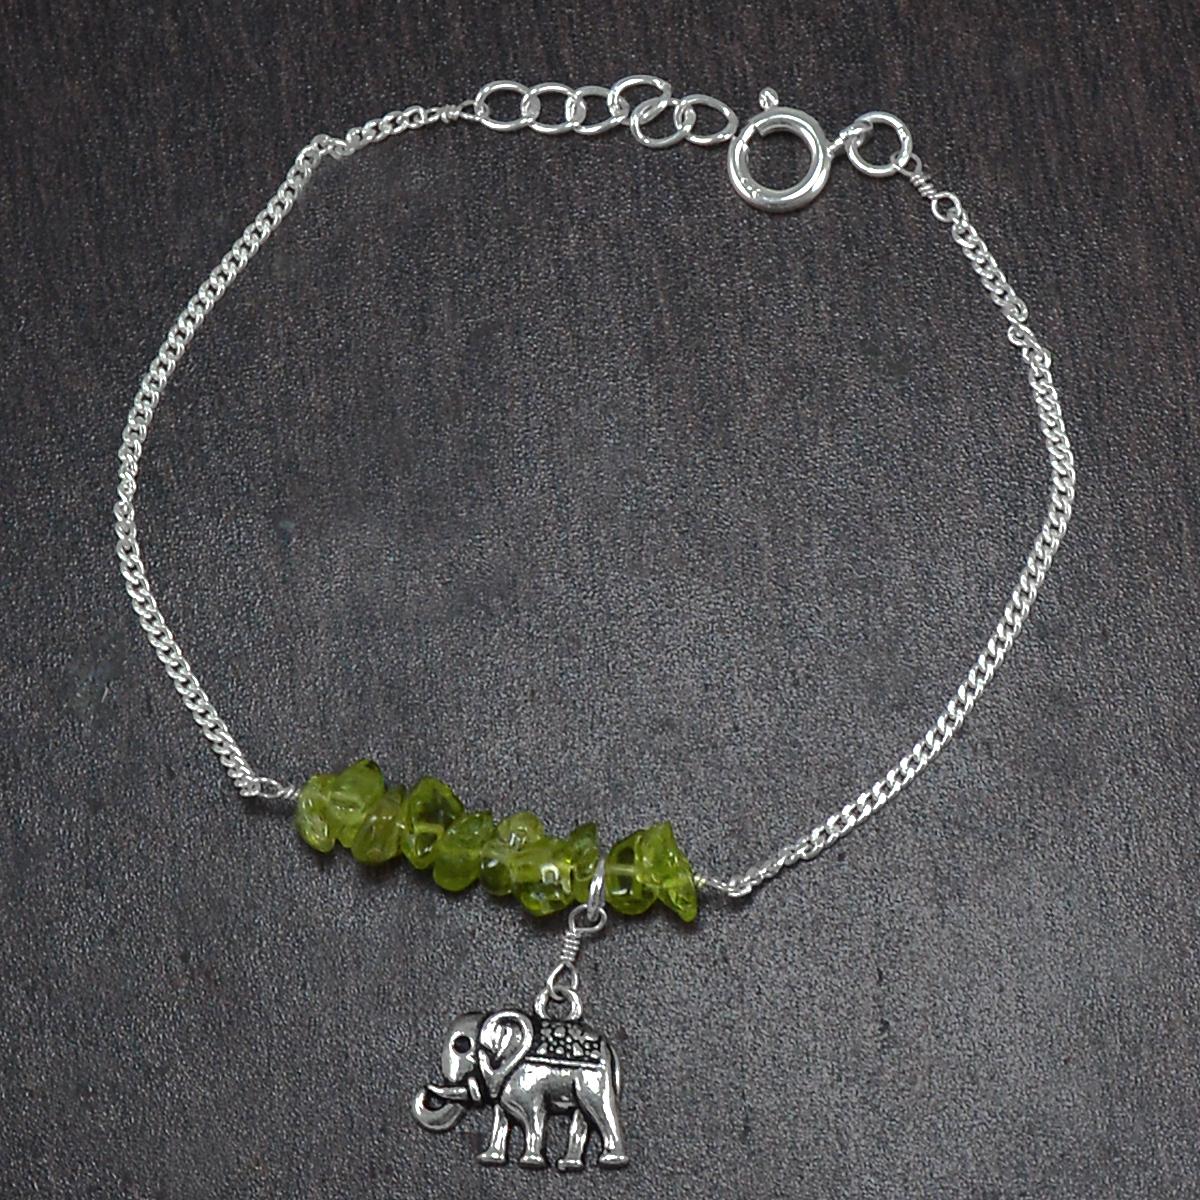 Peridot Gemstone Silver Bracelet PG-155864